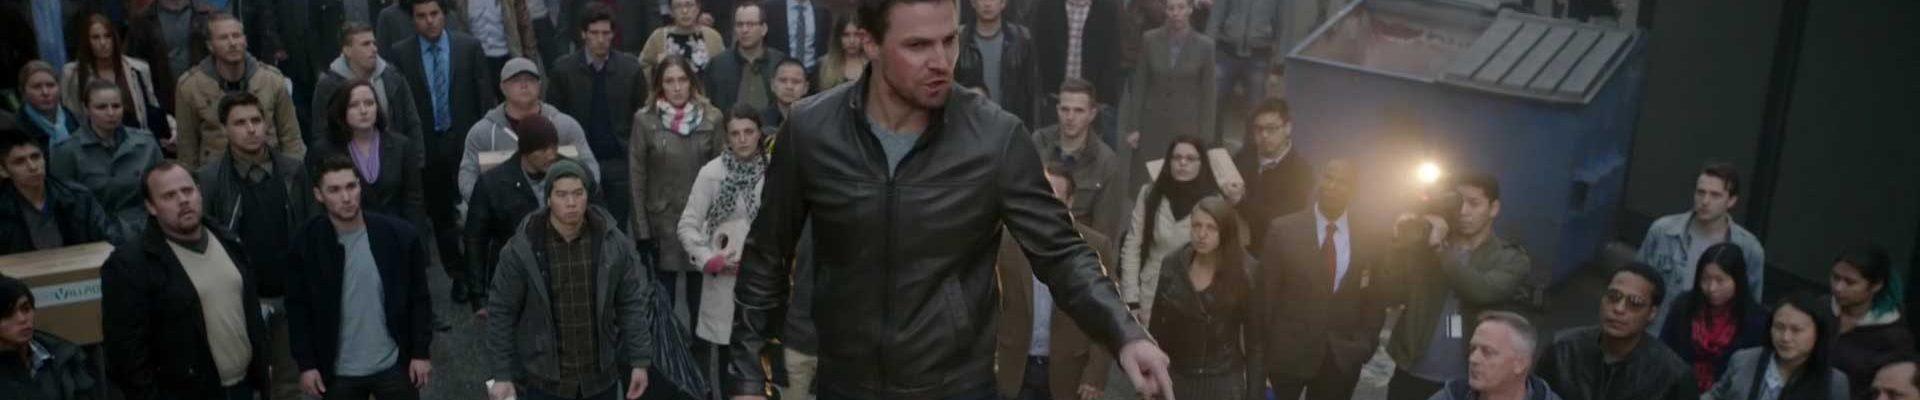 Arrow S04E23